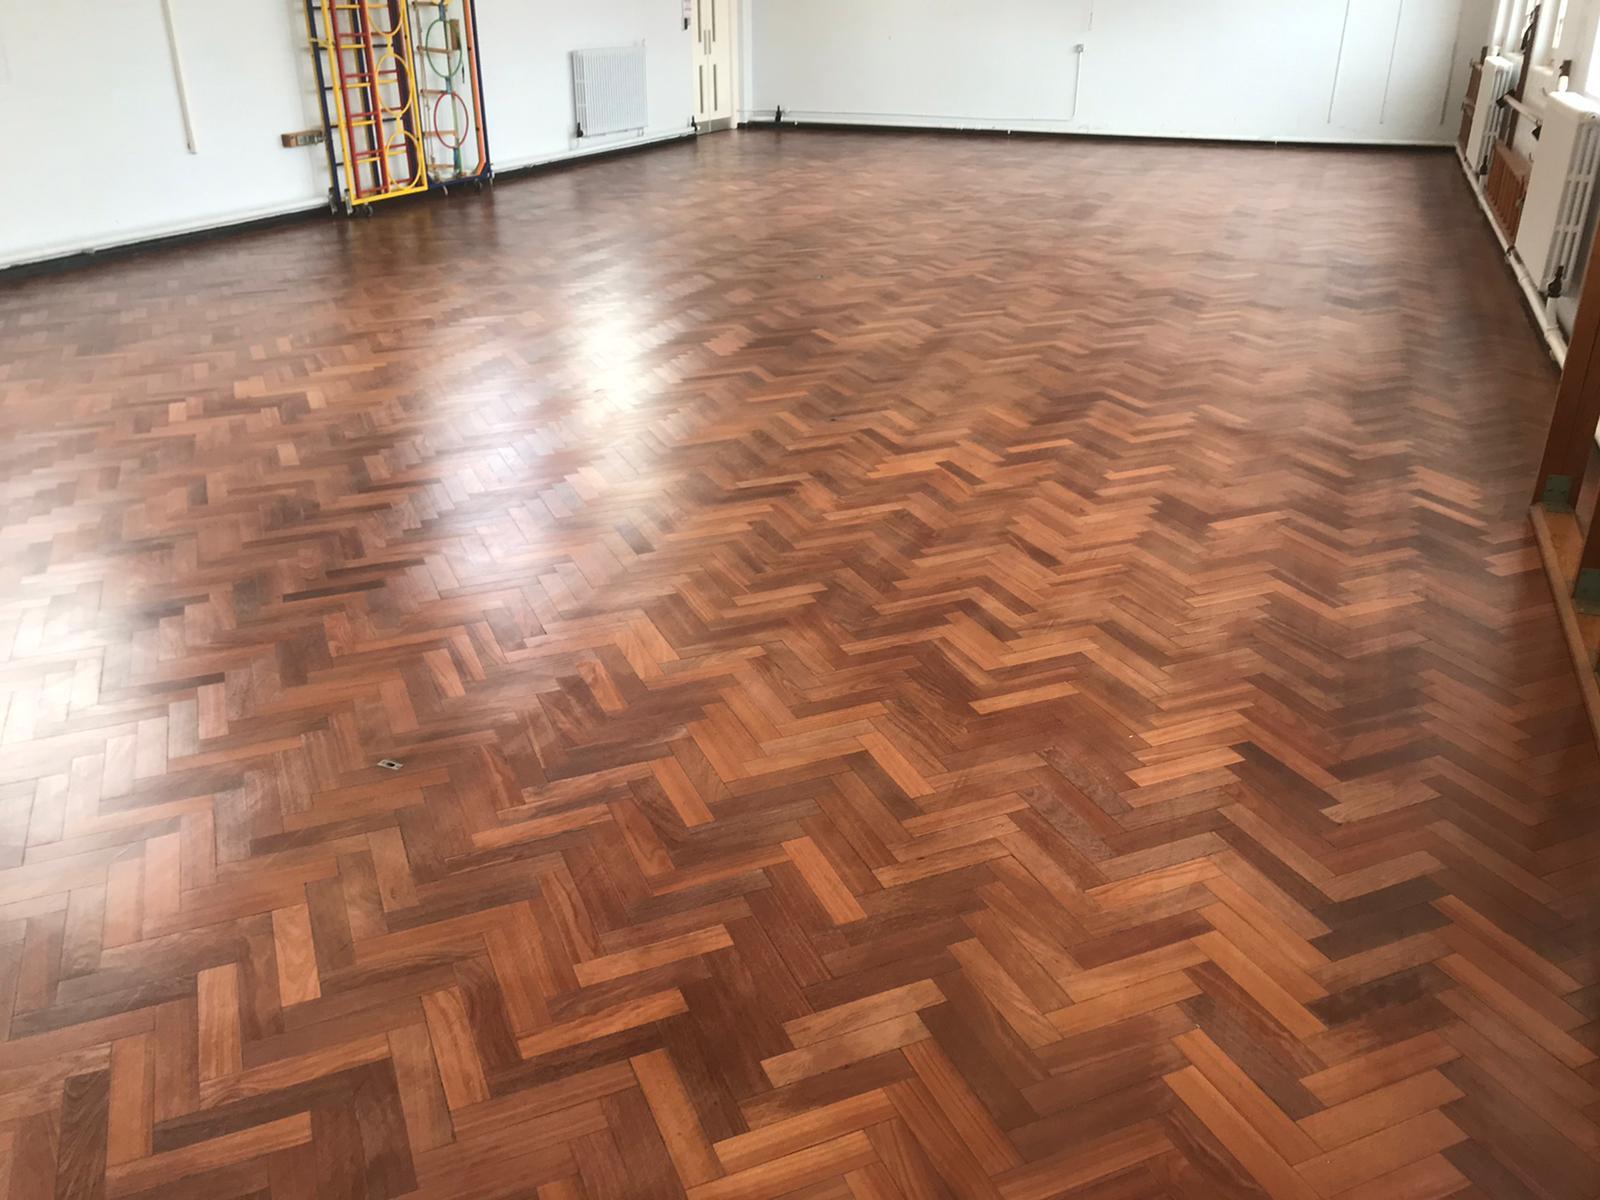 Sand & Seal wood block floor restoration